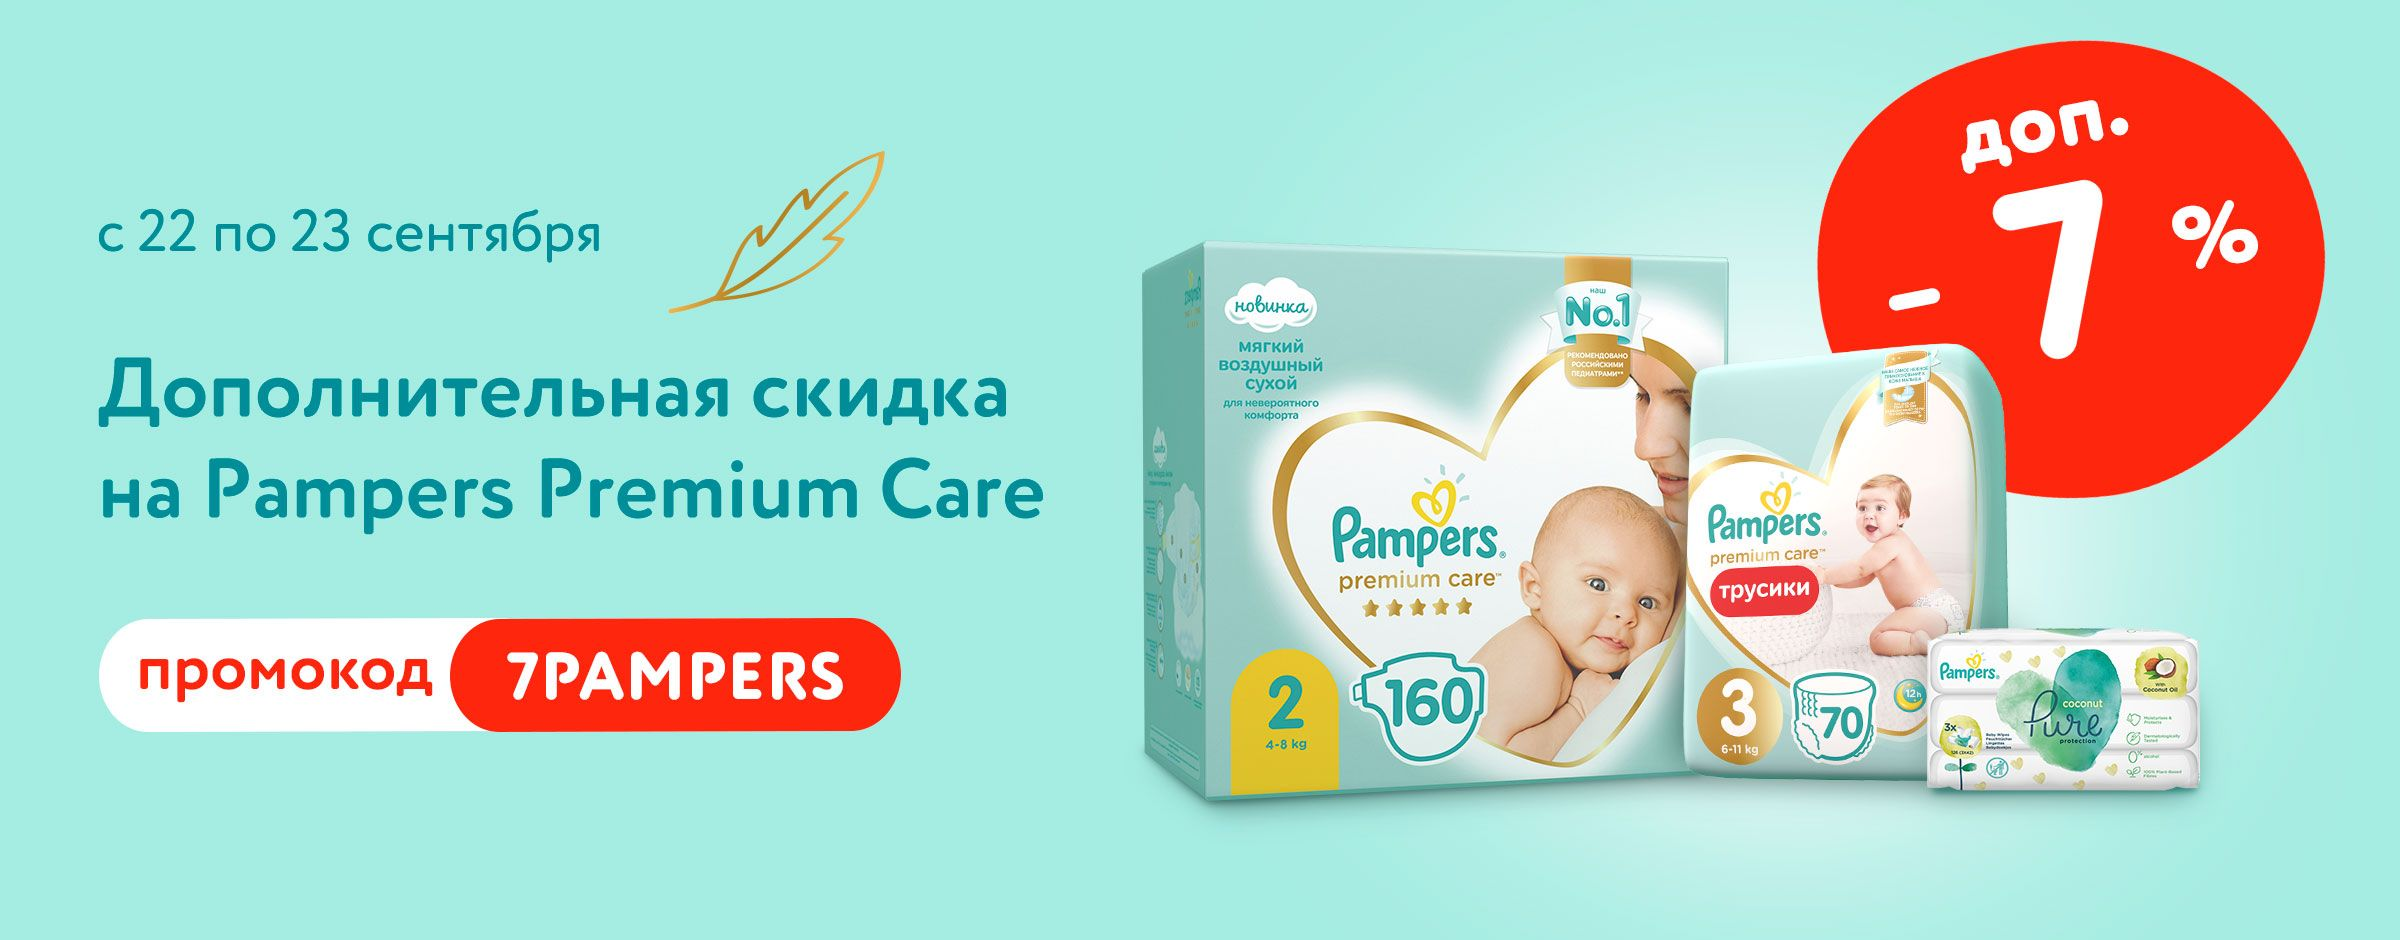 Pampers Premium Care статика 2